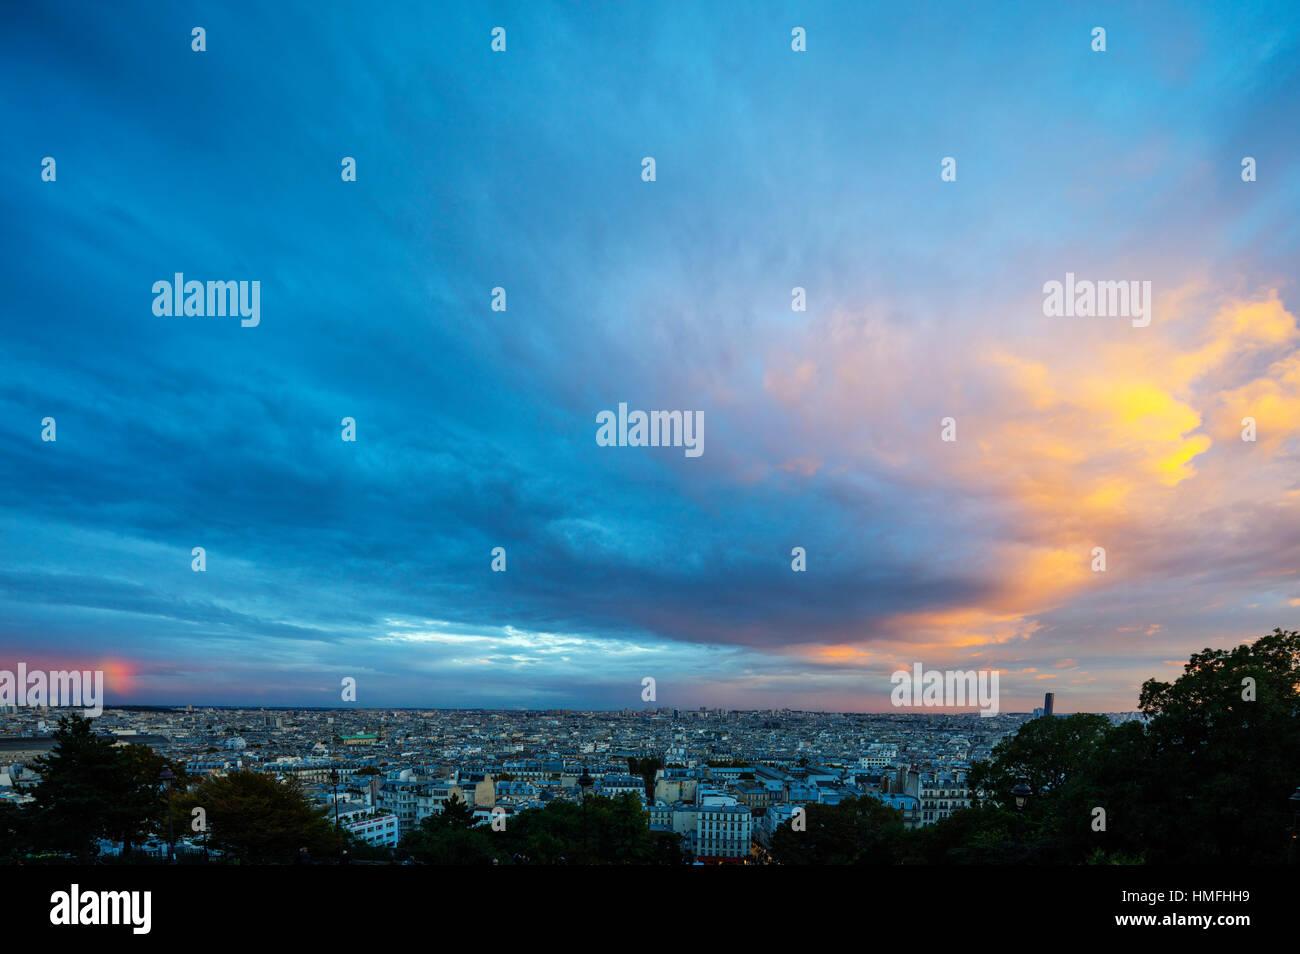 City skyline from Montmartre, Paris, France Stock Photo